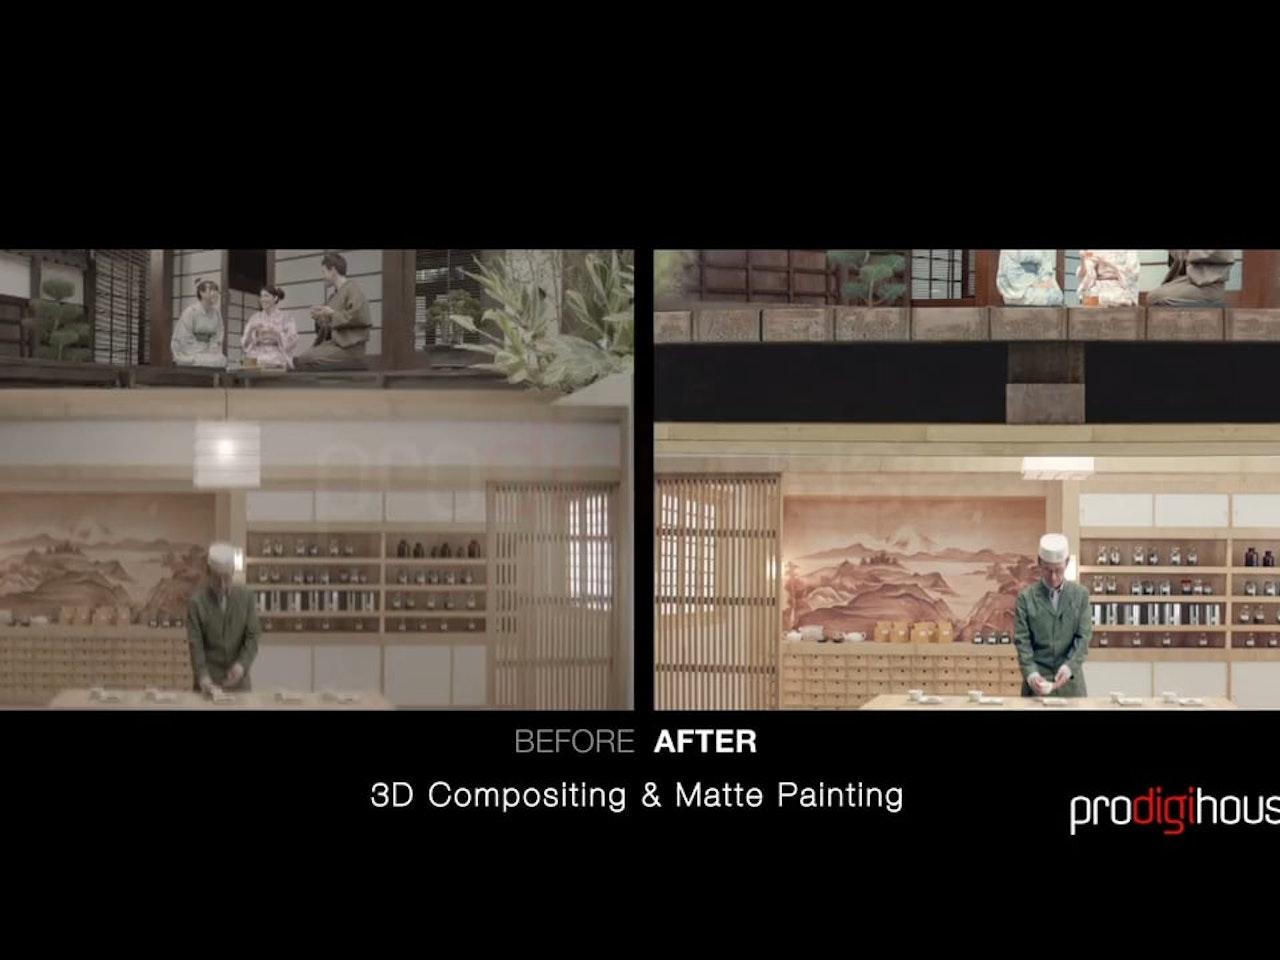 PRODIGIHOUSE - VFX COMPILE REELS